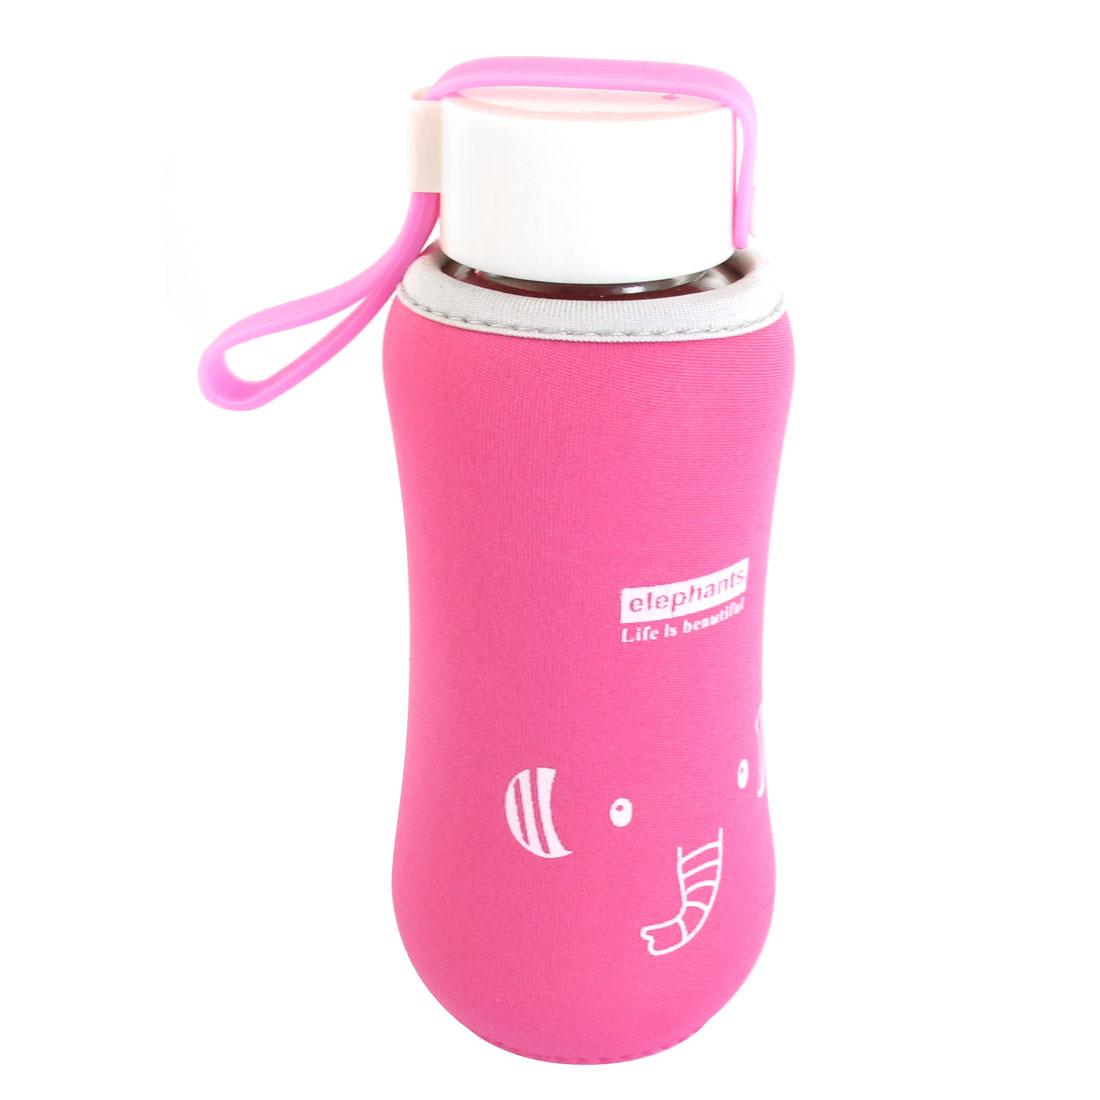 250ML Travel Mug Pink Nylon Protect Sleeve Shatterproof Hand Portable Water Bottle Glass Cup